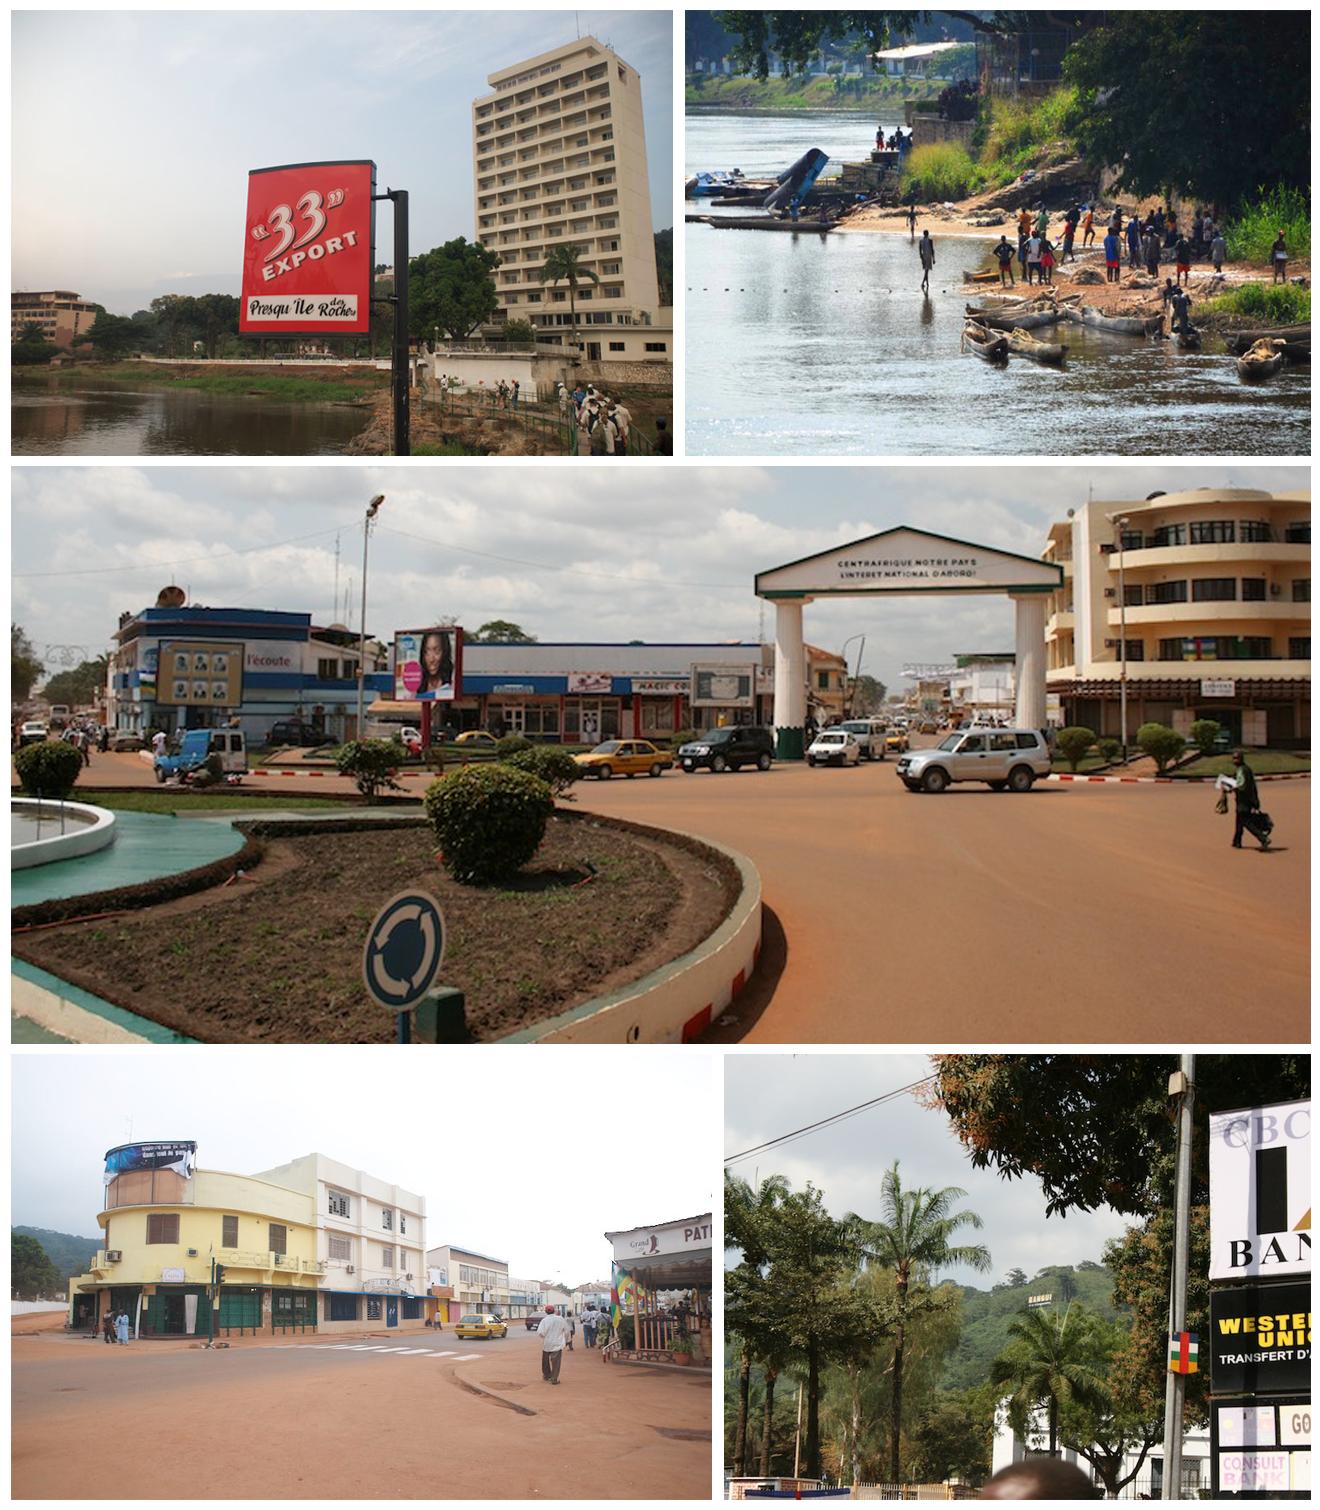 Depiction of Bangui